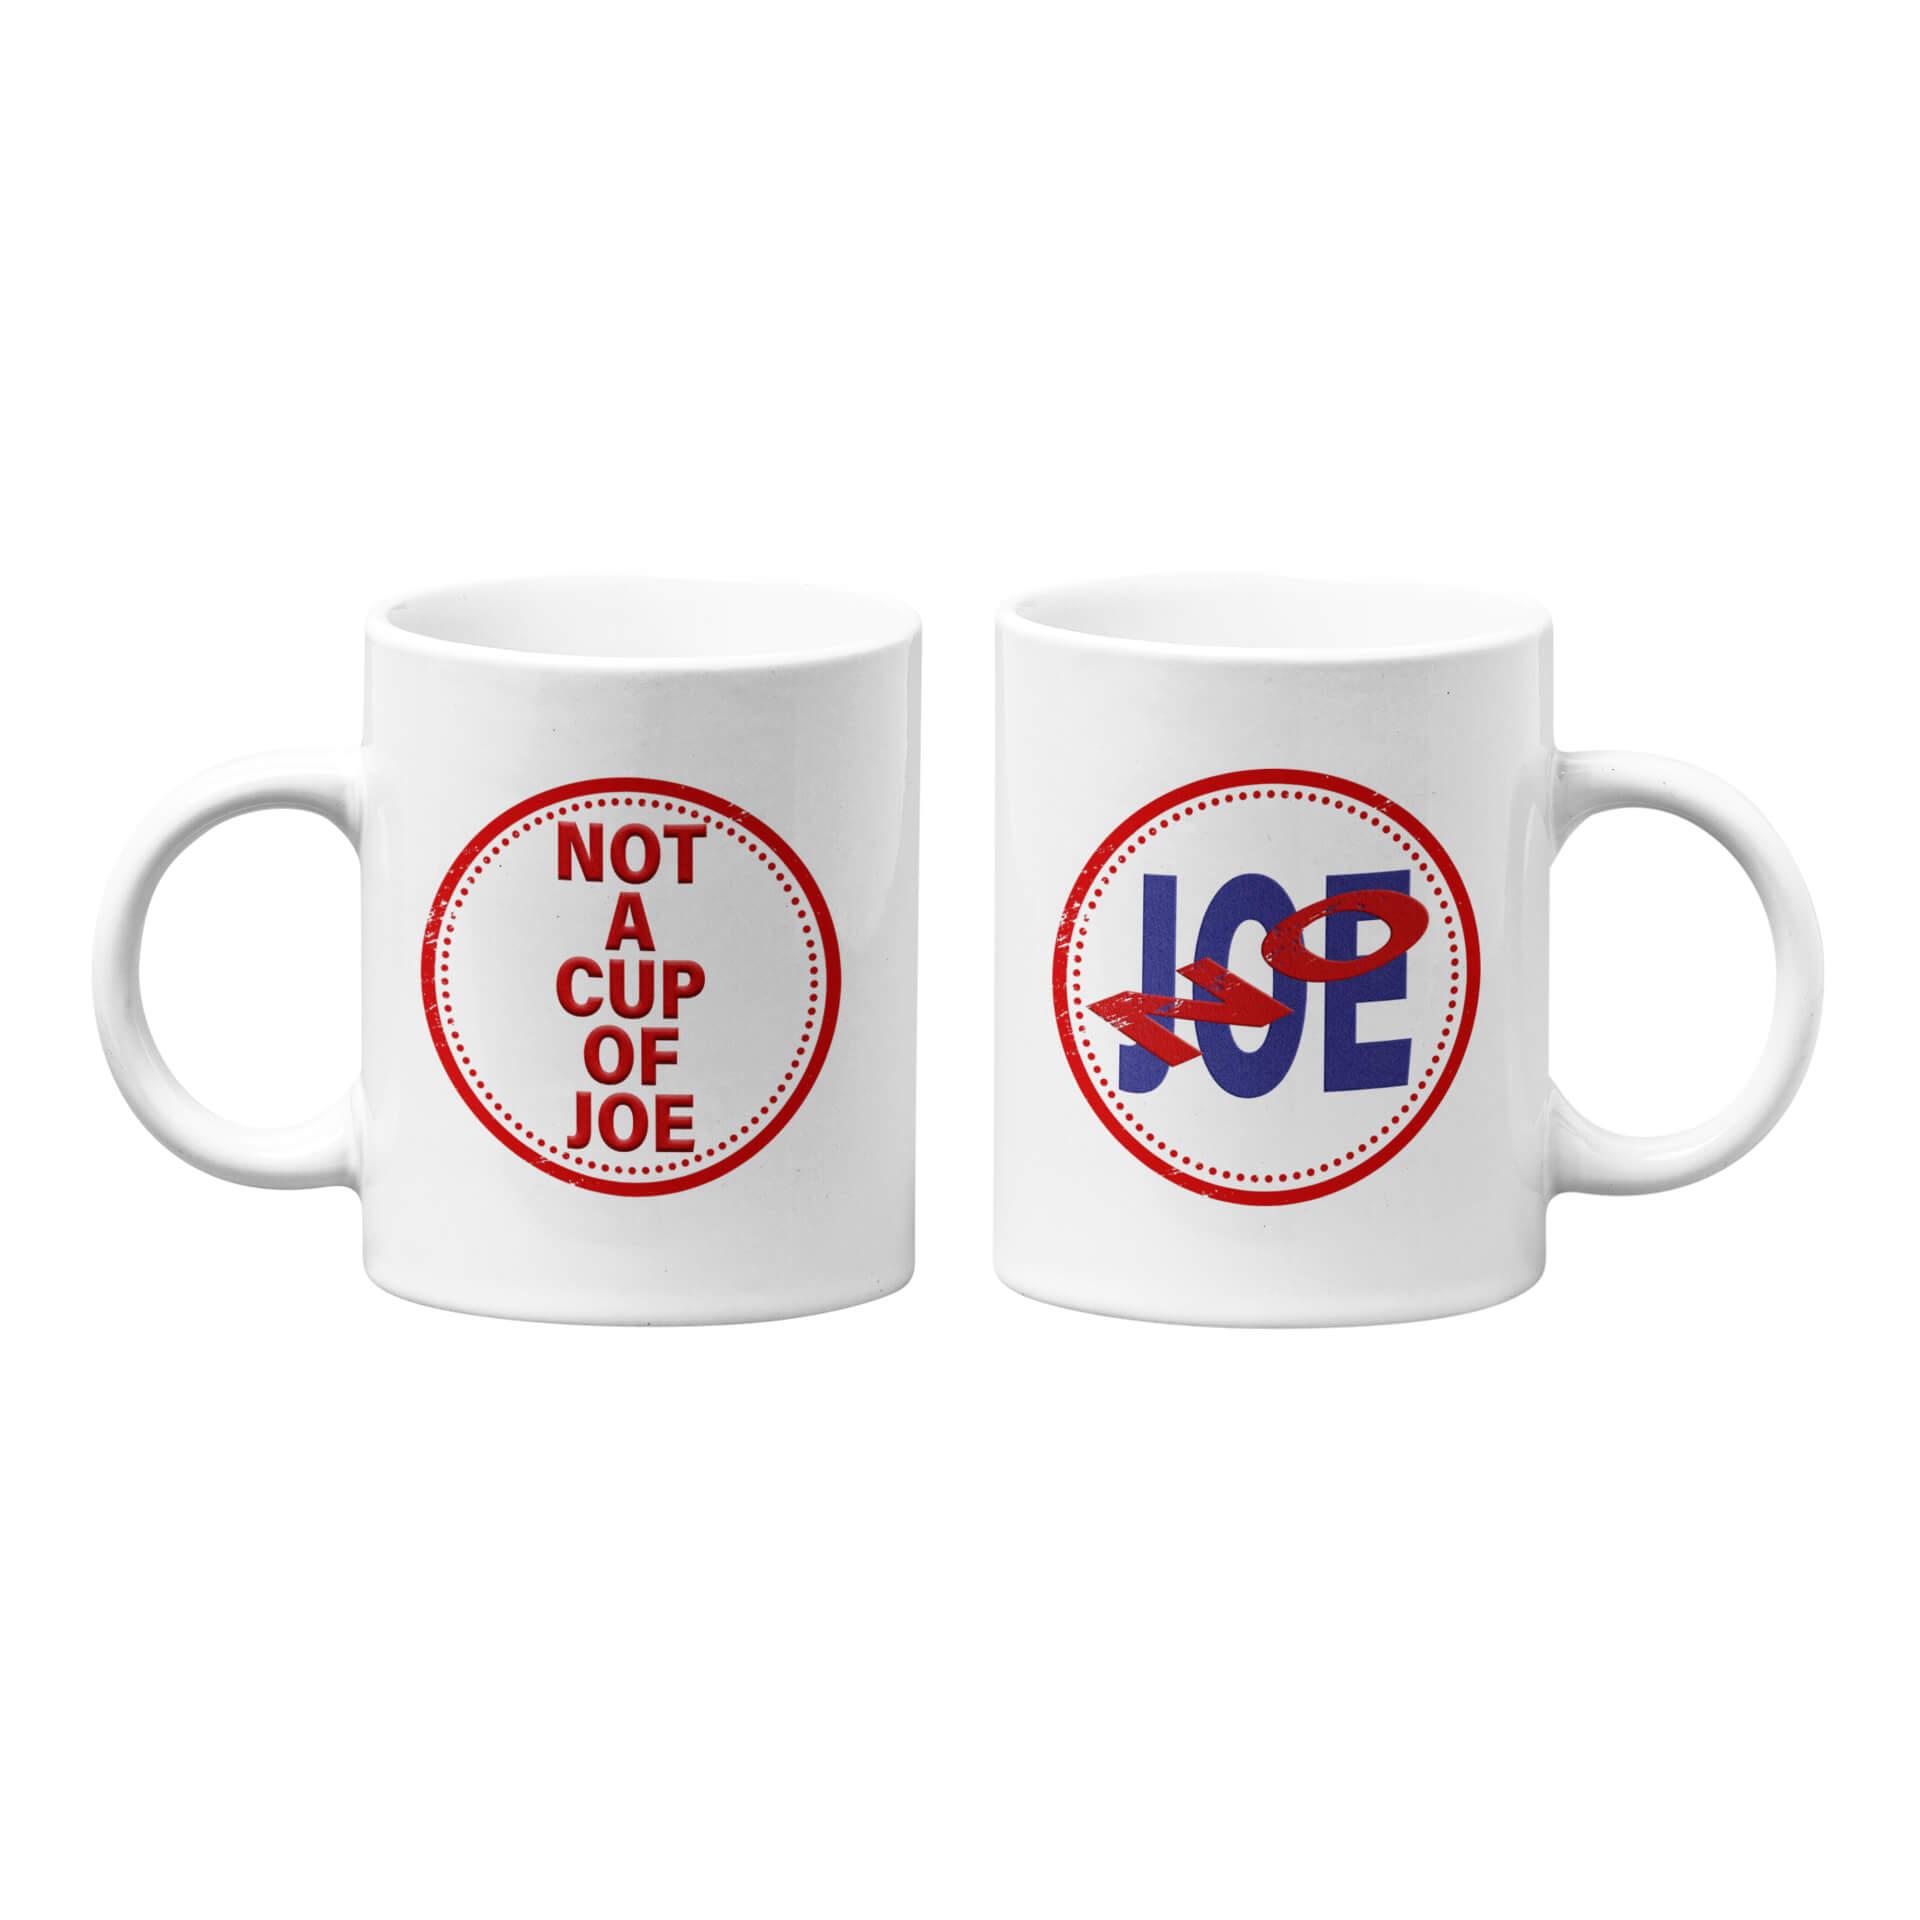 No Joe - Not A Cup of Joe Mug